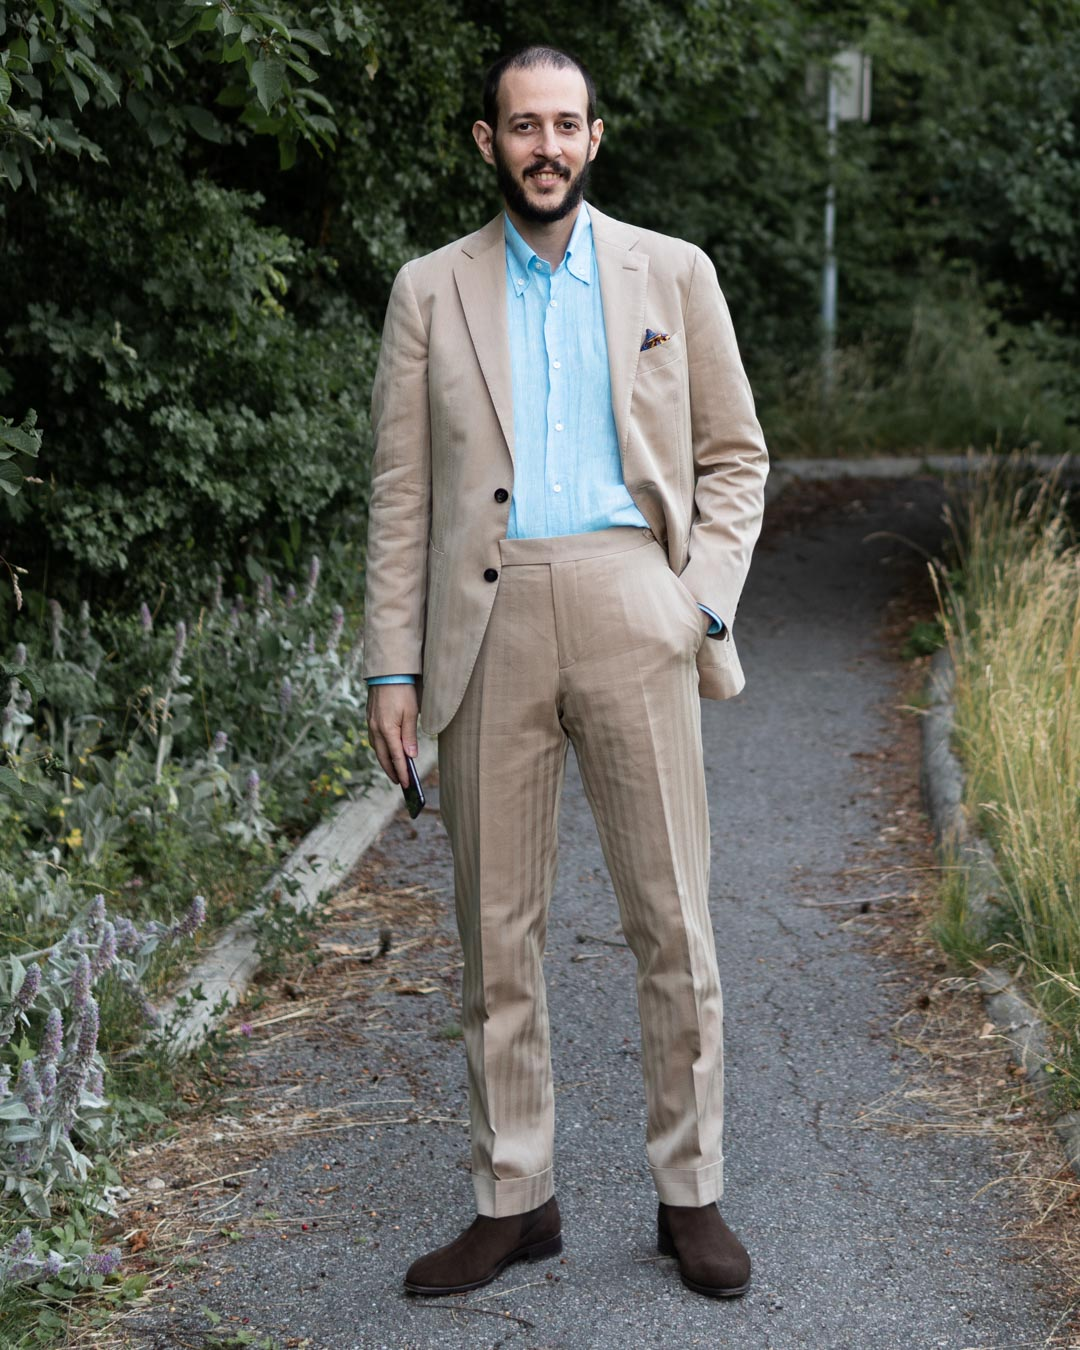 Washington Trousers